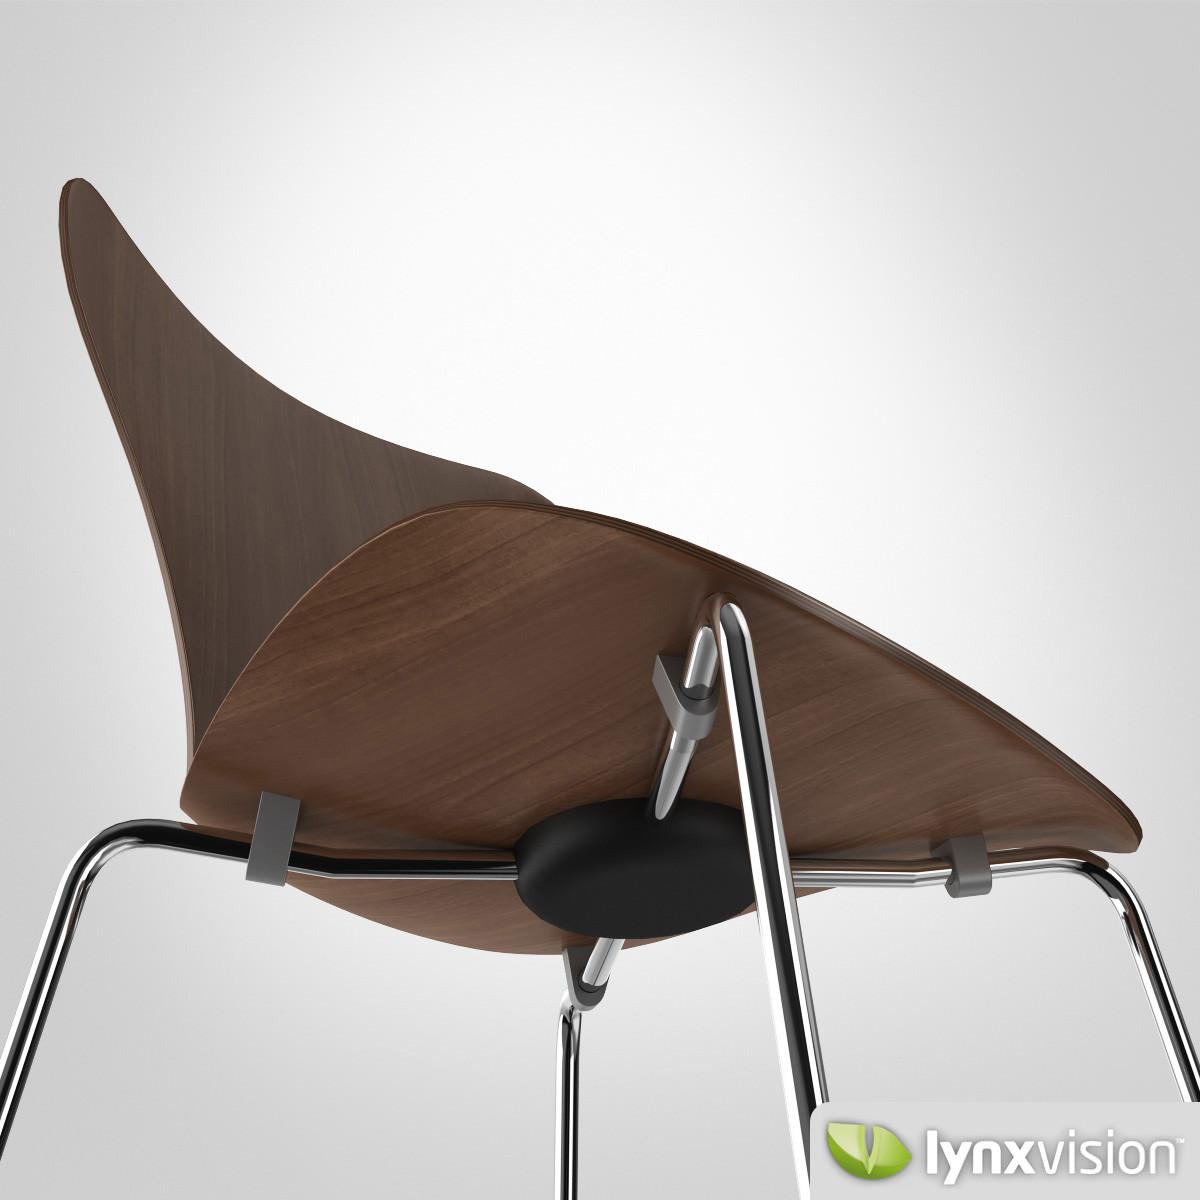 ... Serie 7 Chair By Arne Jacobsen 3d Model Max Obj Fbx Mtl 5 ...